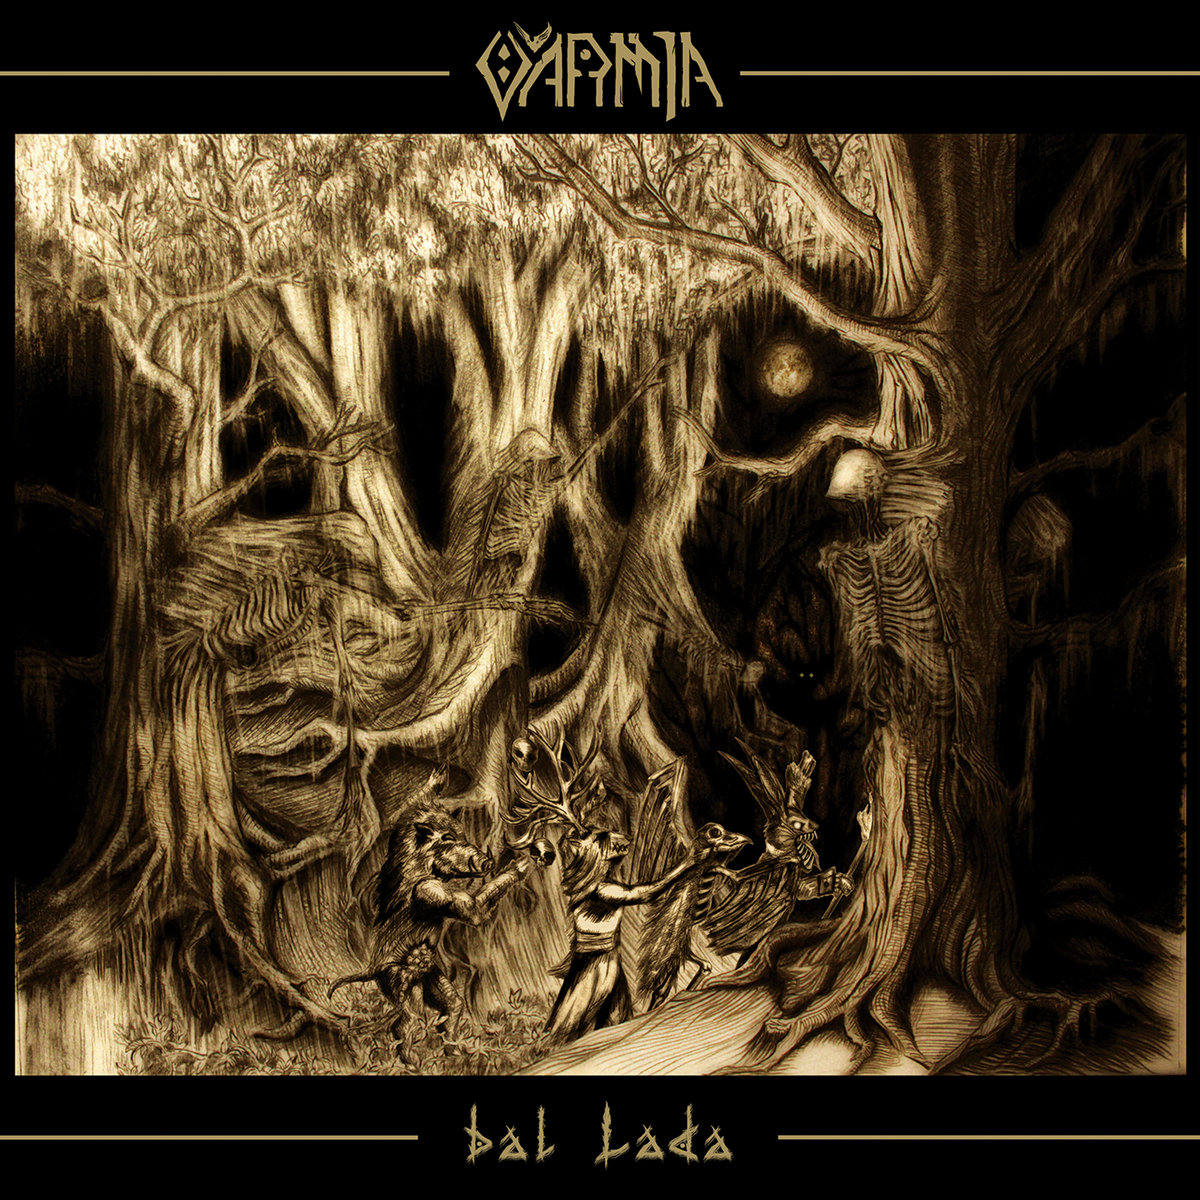 Varmia: Bal Lada